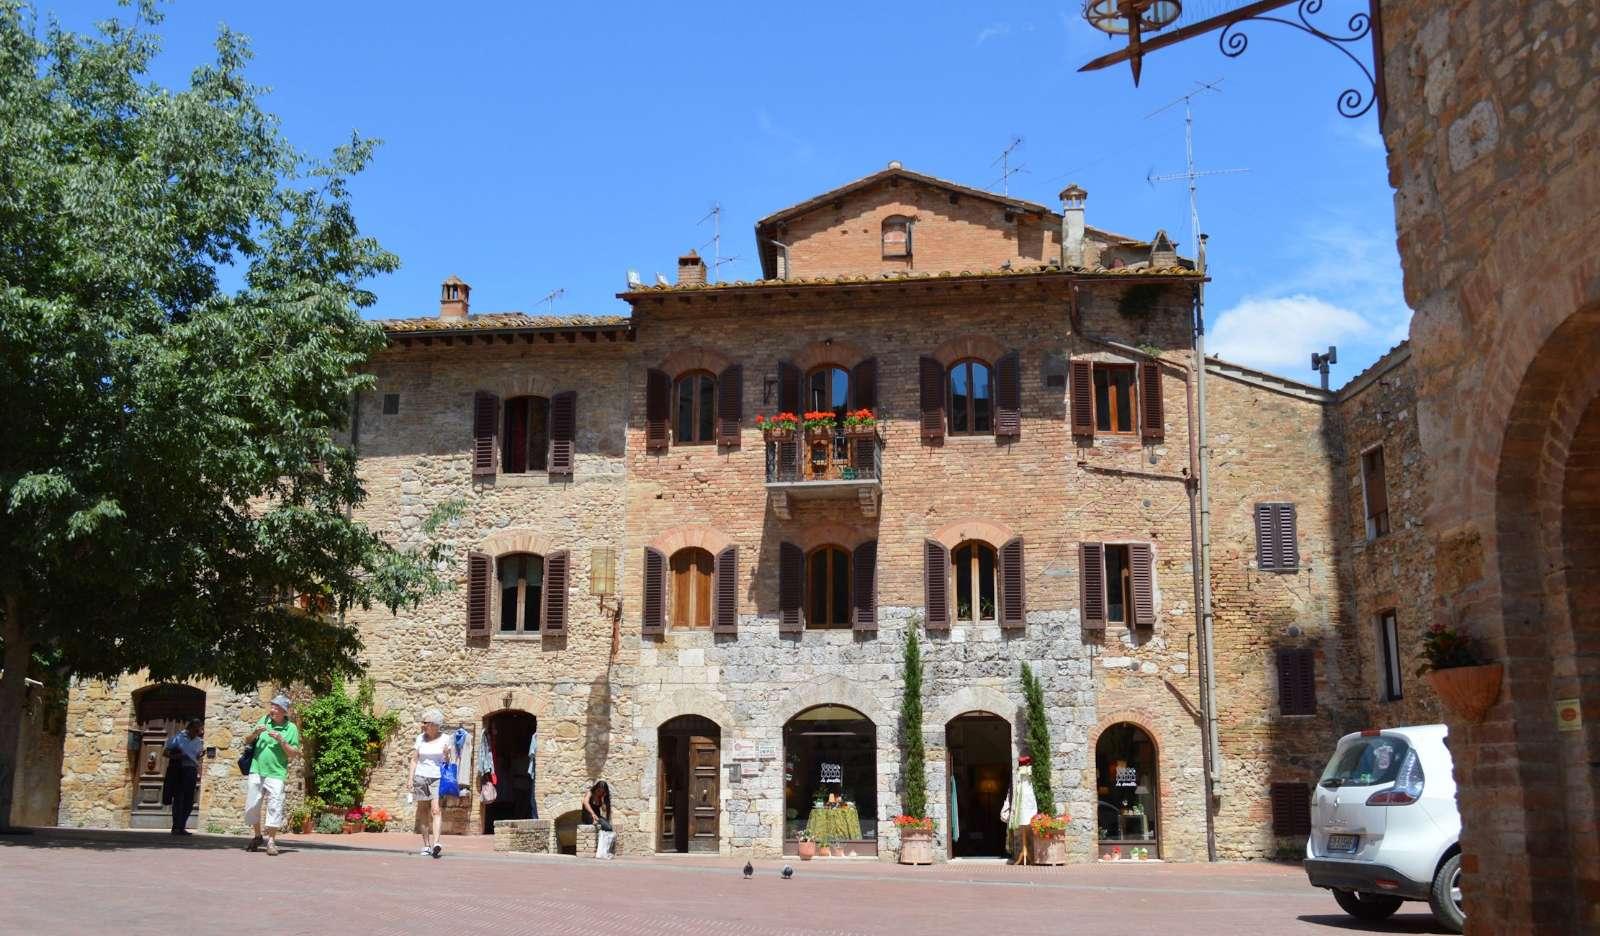 Gatlivet i San Gimignano